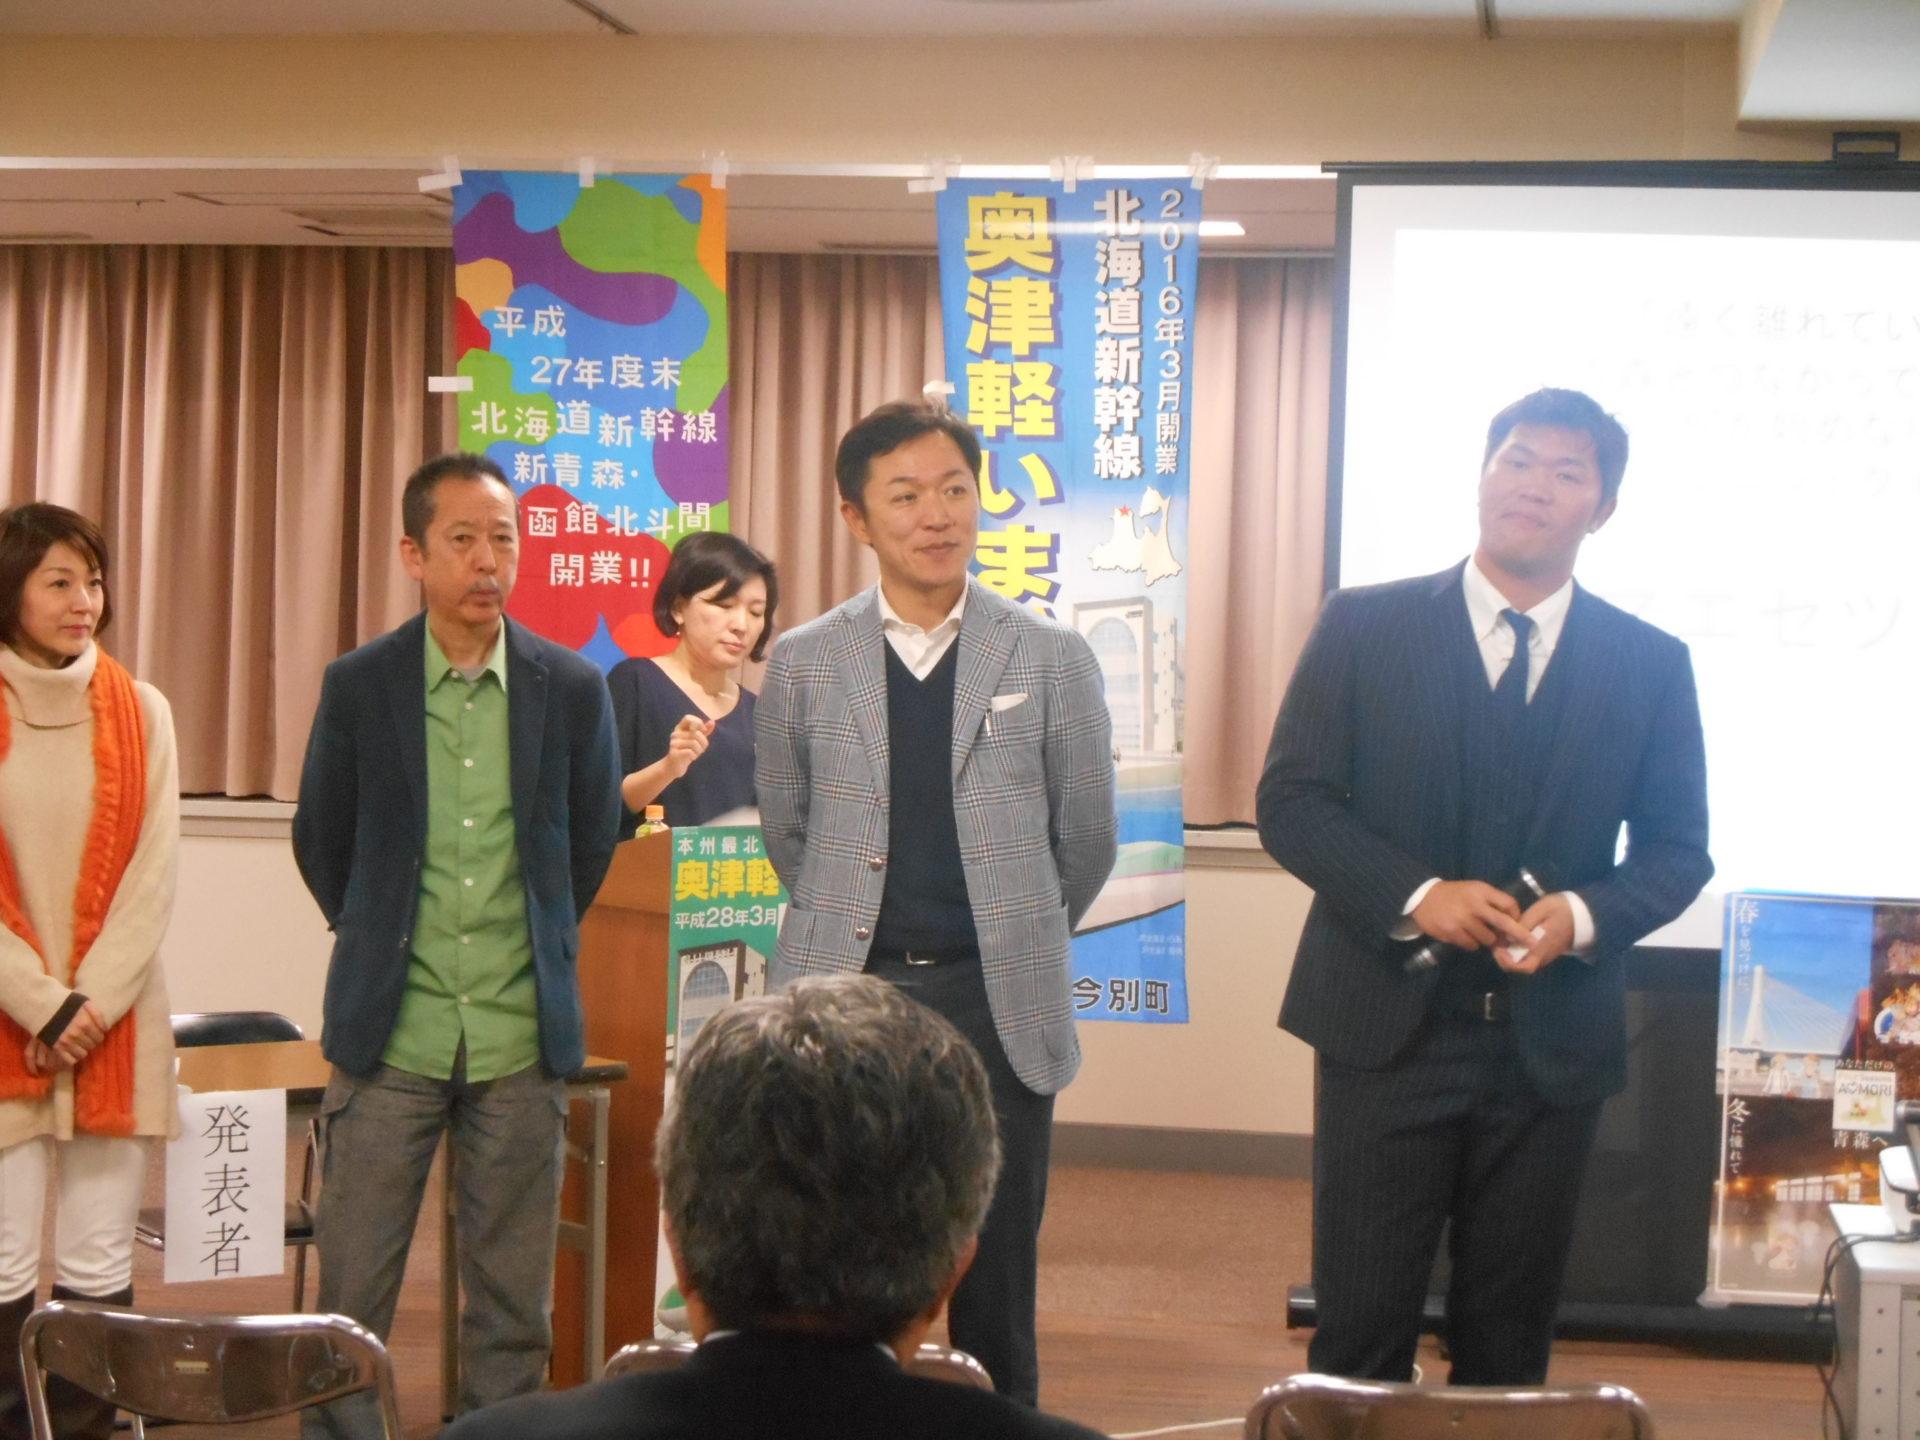 DSCN2723 1920x1440 - 第5回青森ゼミナールのアドバイザーで天間会長、西村副会長参加